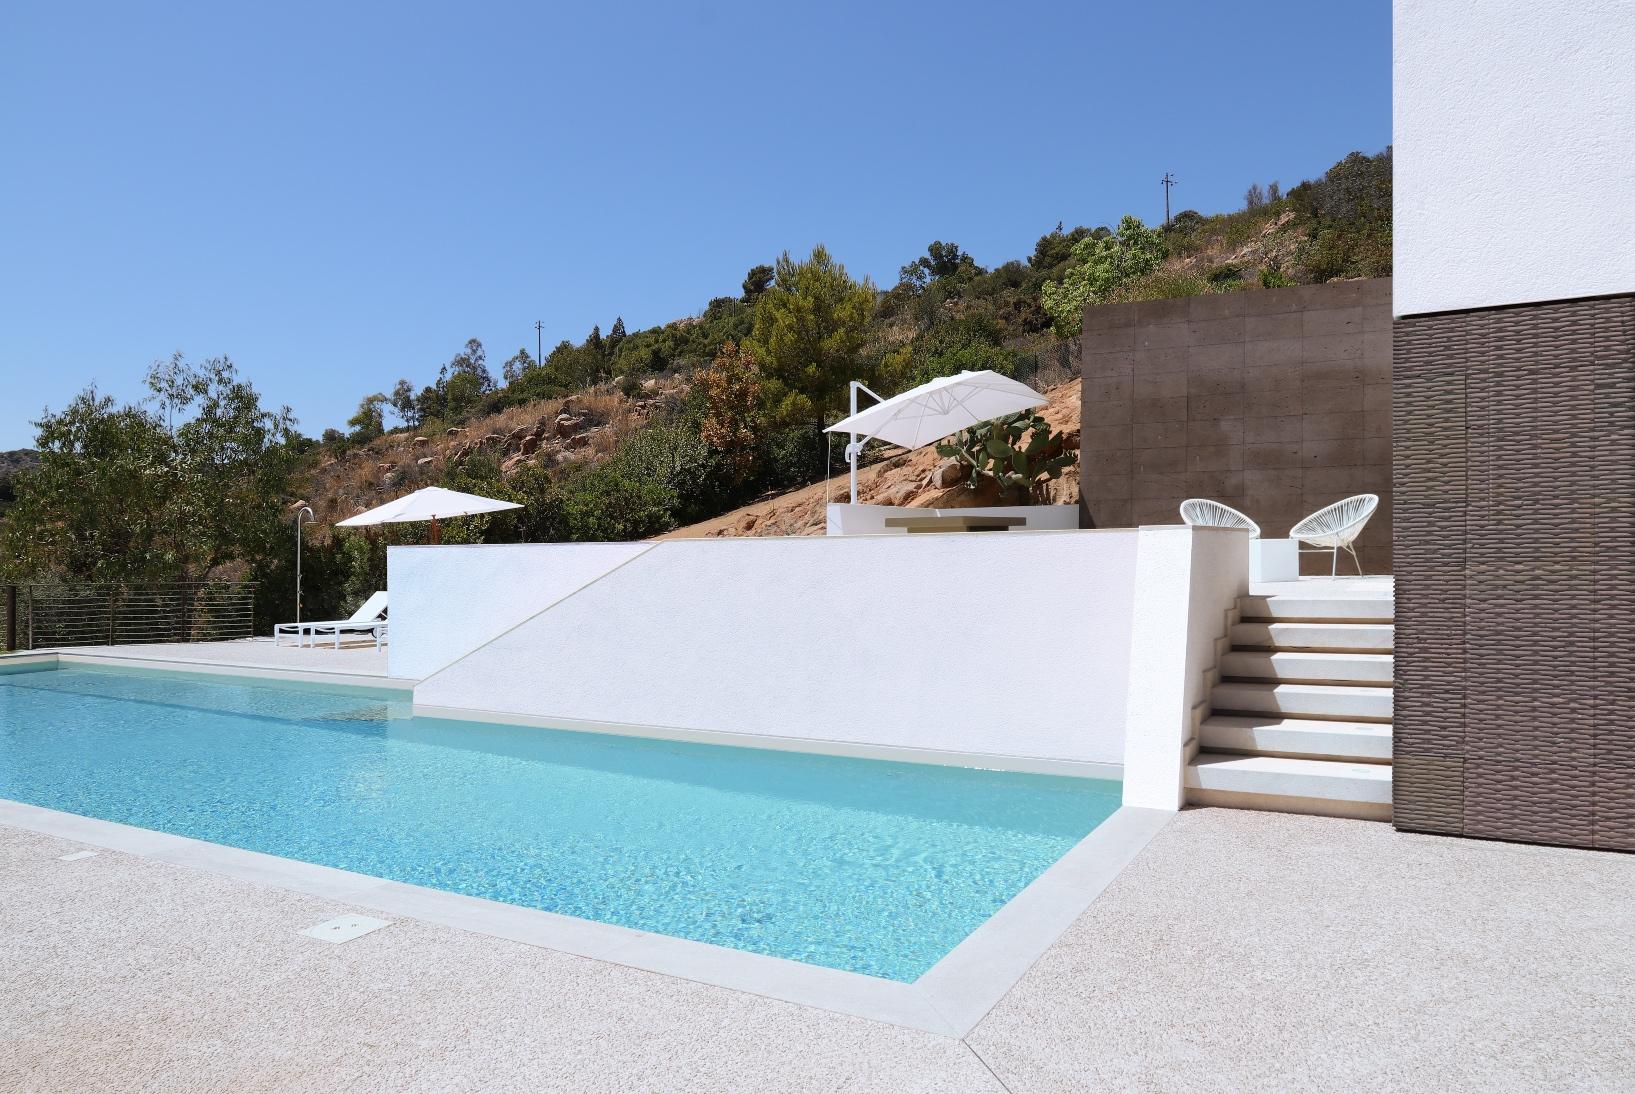 7_House-along-Sardinias-Coastline_Pierluigi-Piu_Inspirationist